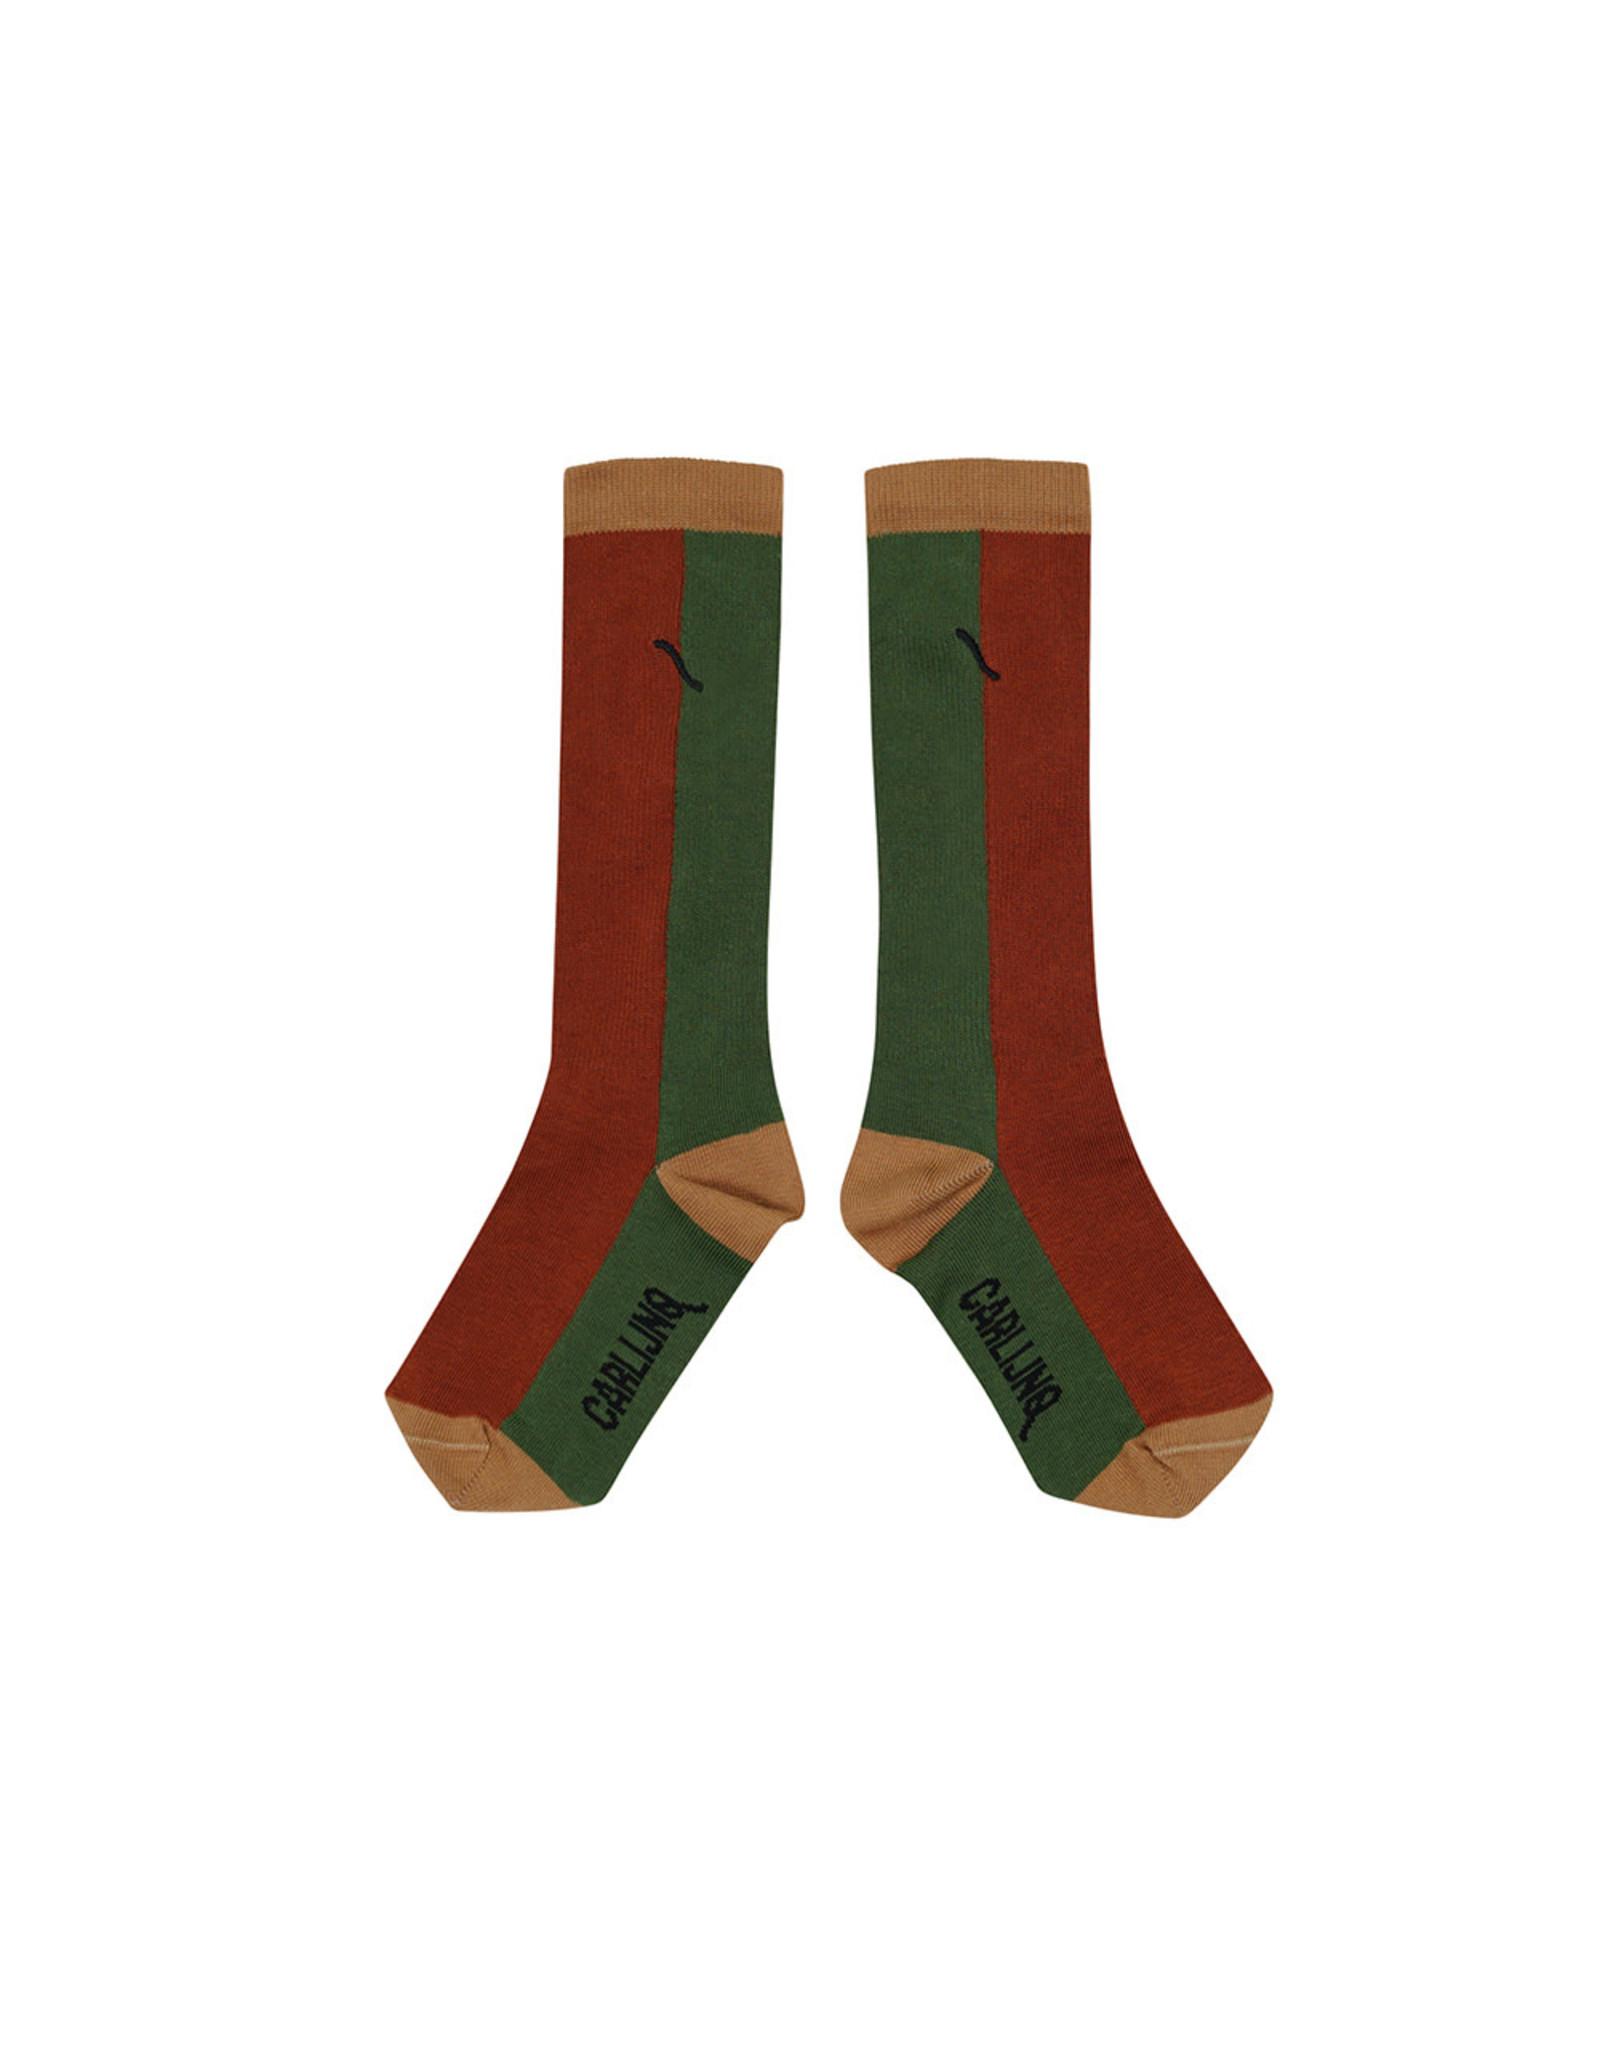 Carlijn Q Carlijn Q Knee Socks - Color Block Ginger/Green